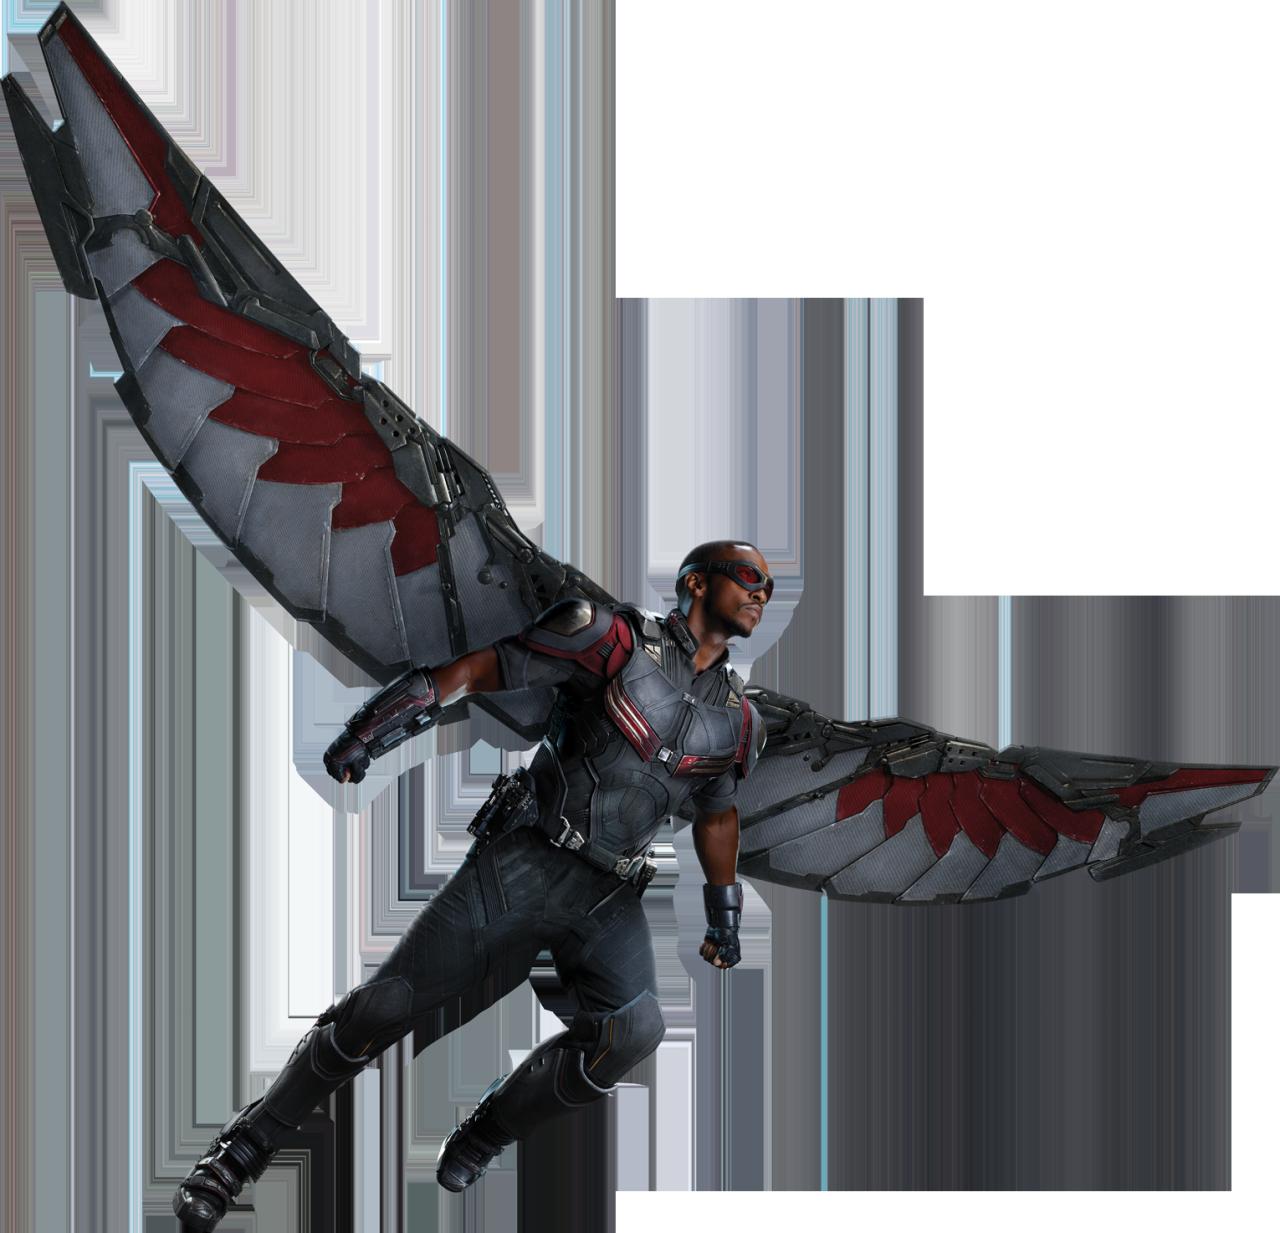 Imagen - Civil War Full Body - Falcon.png   Marvel ...